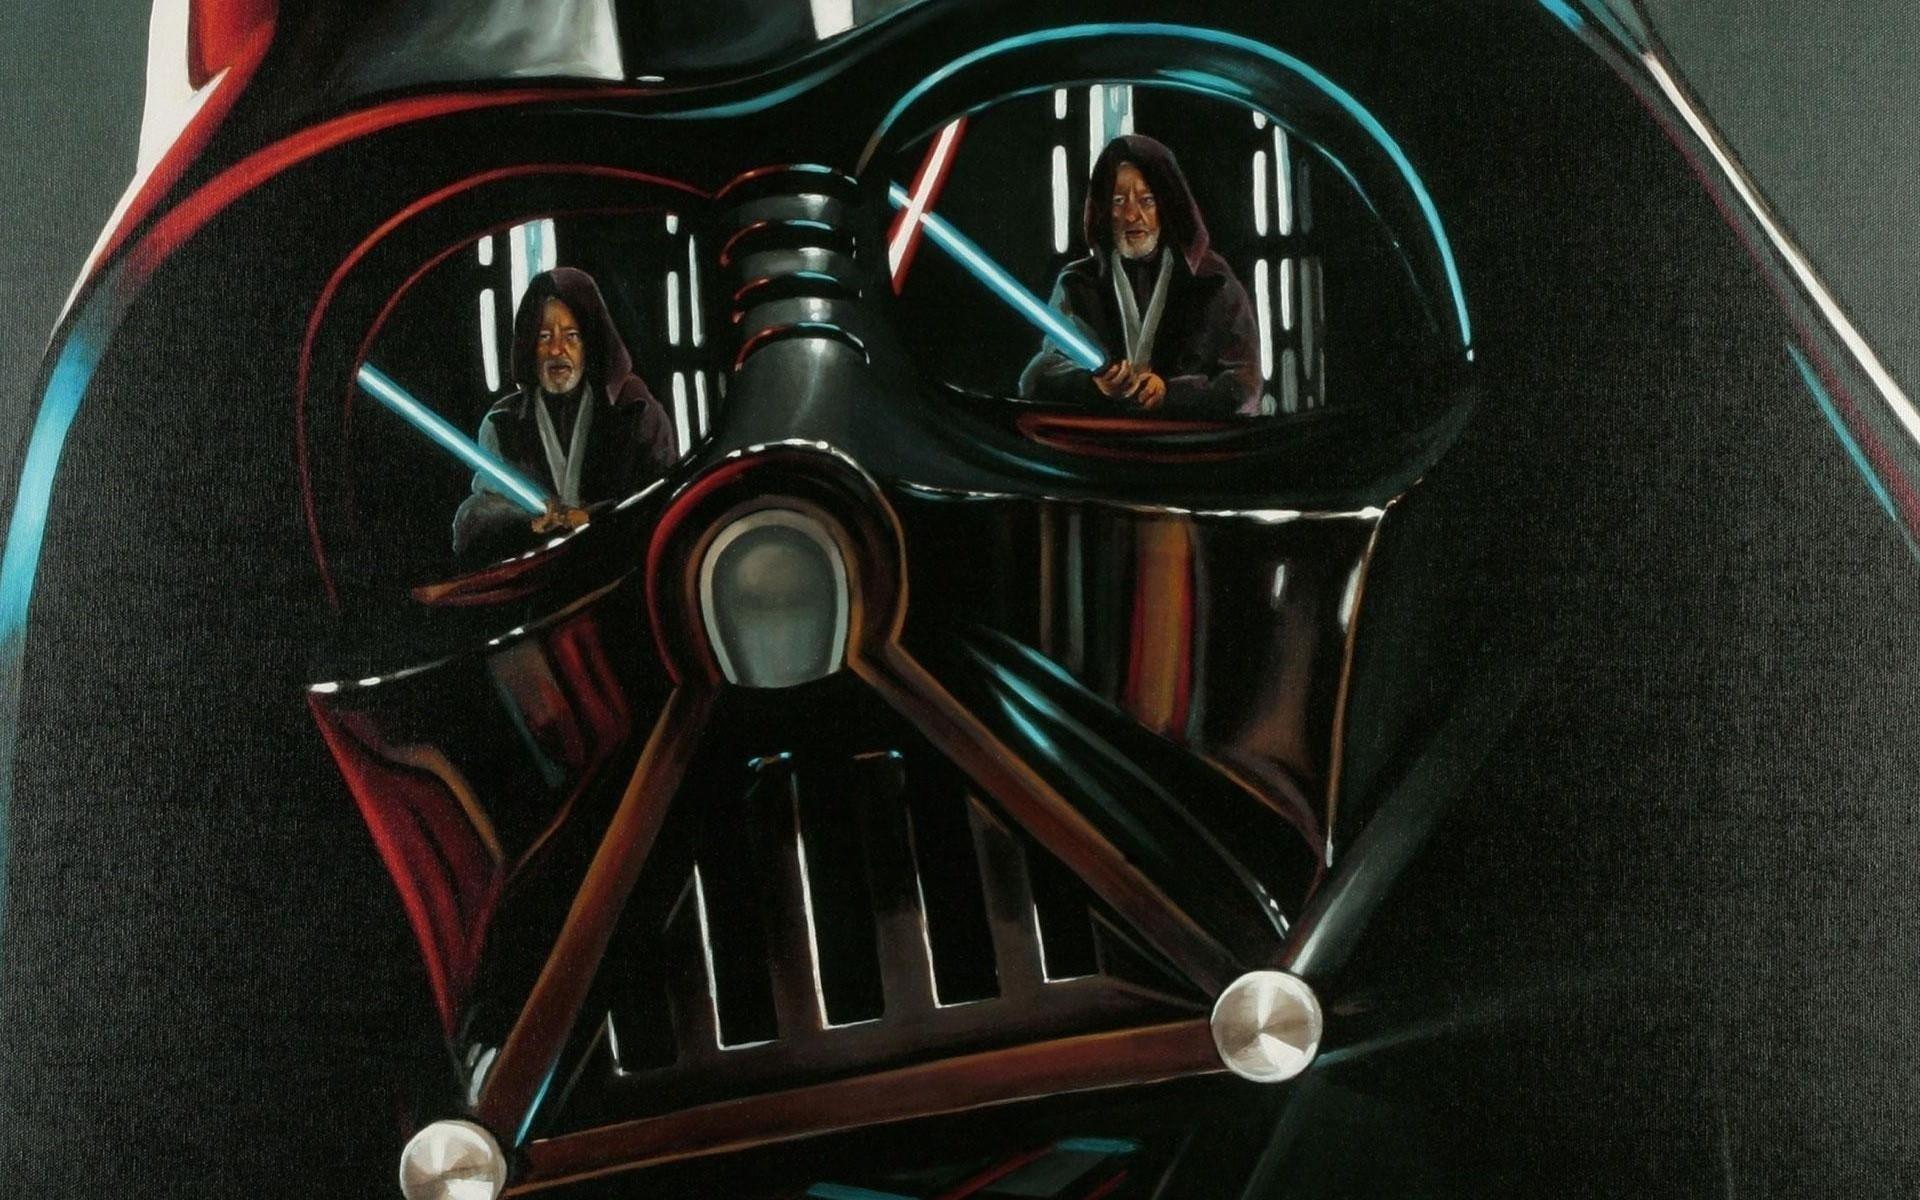 Star Wars Darth Vader Obi Wan Kenobi wallpaper background 1920x1200